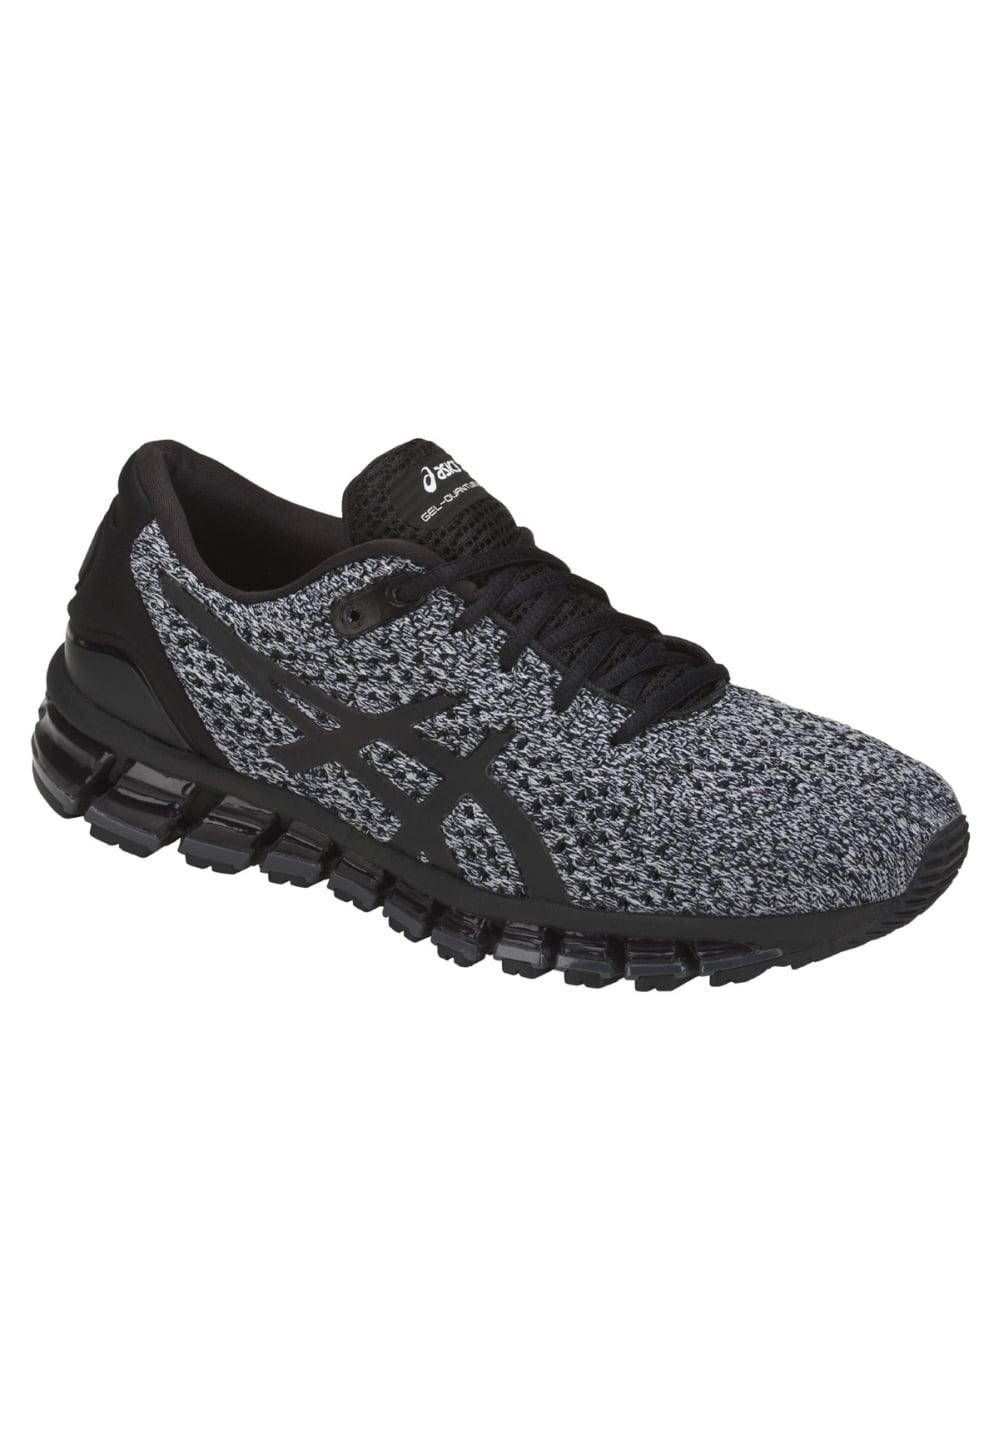 size 40 e925c 98b5c ASICS GEL-Quantum 360 Knit 2 - Running shoes for Women - Black